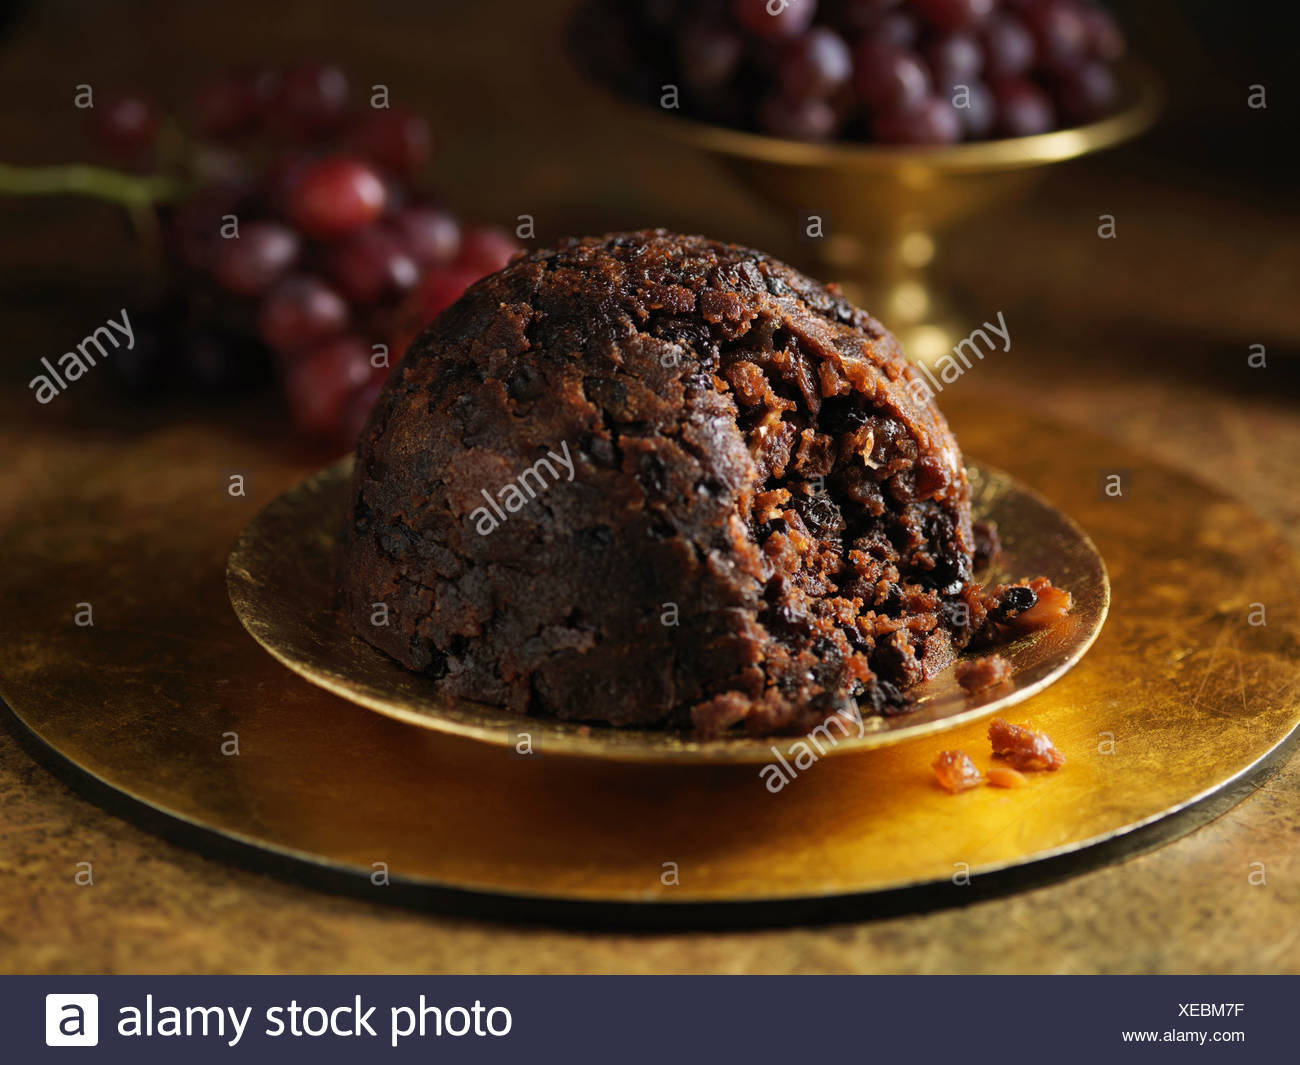 Christmas pudding with fresh grapes - Stock Image